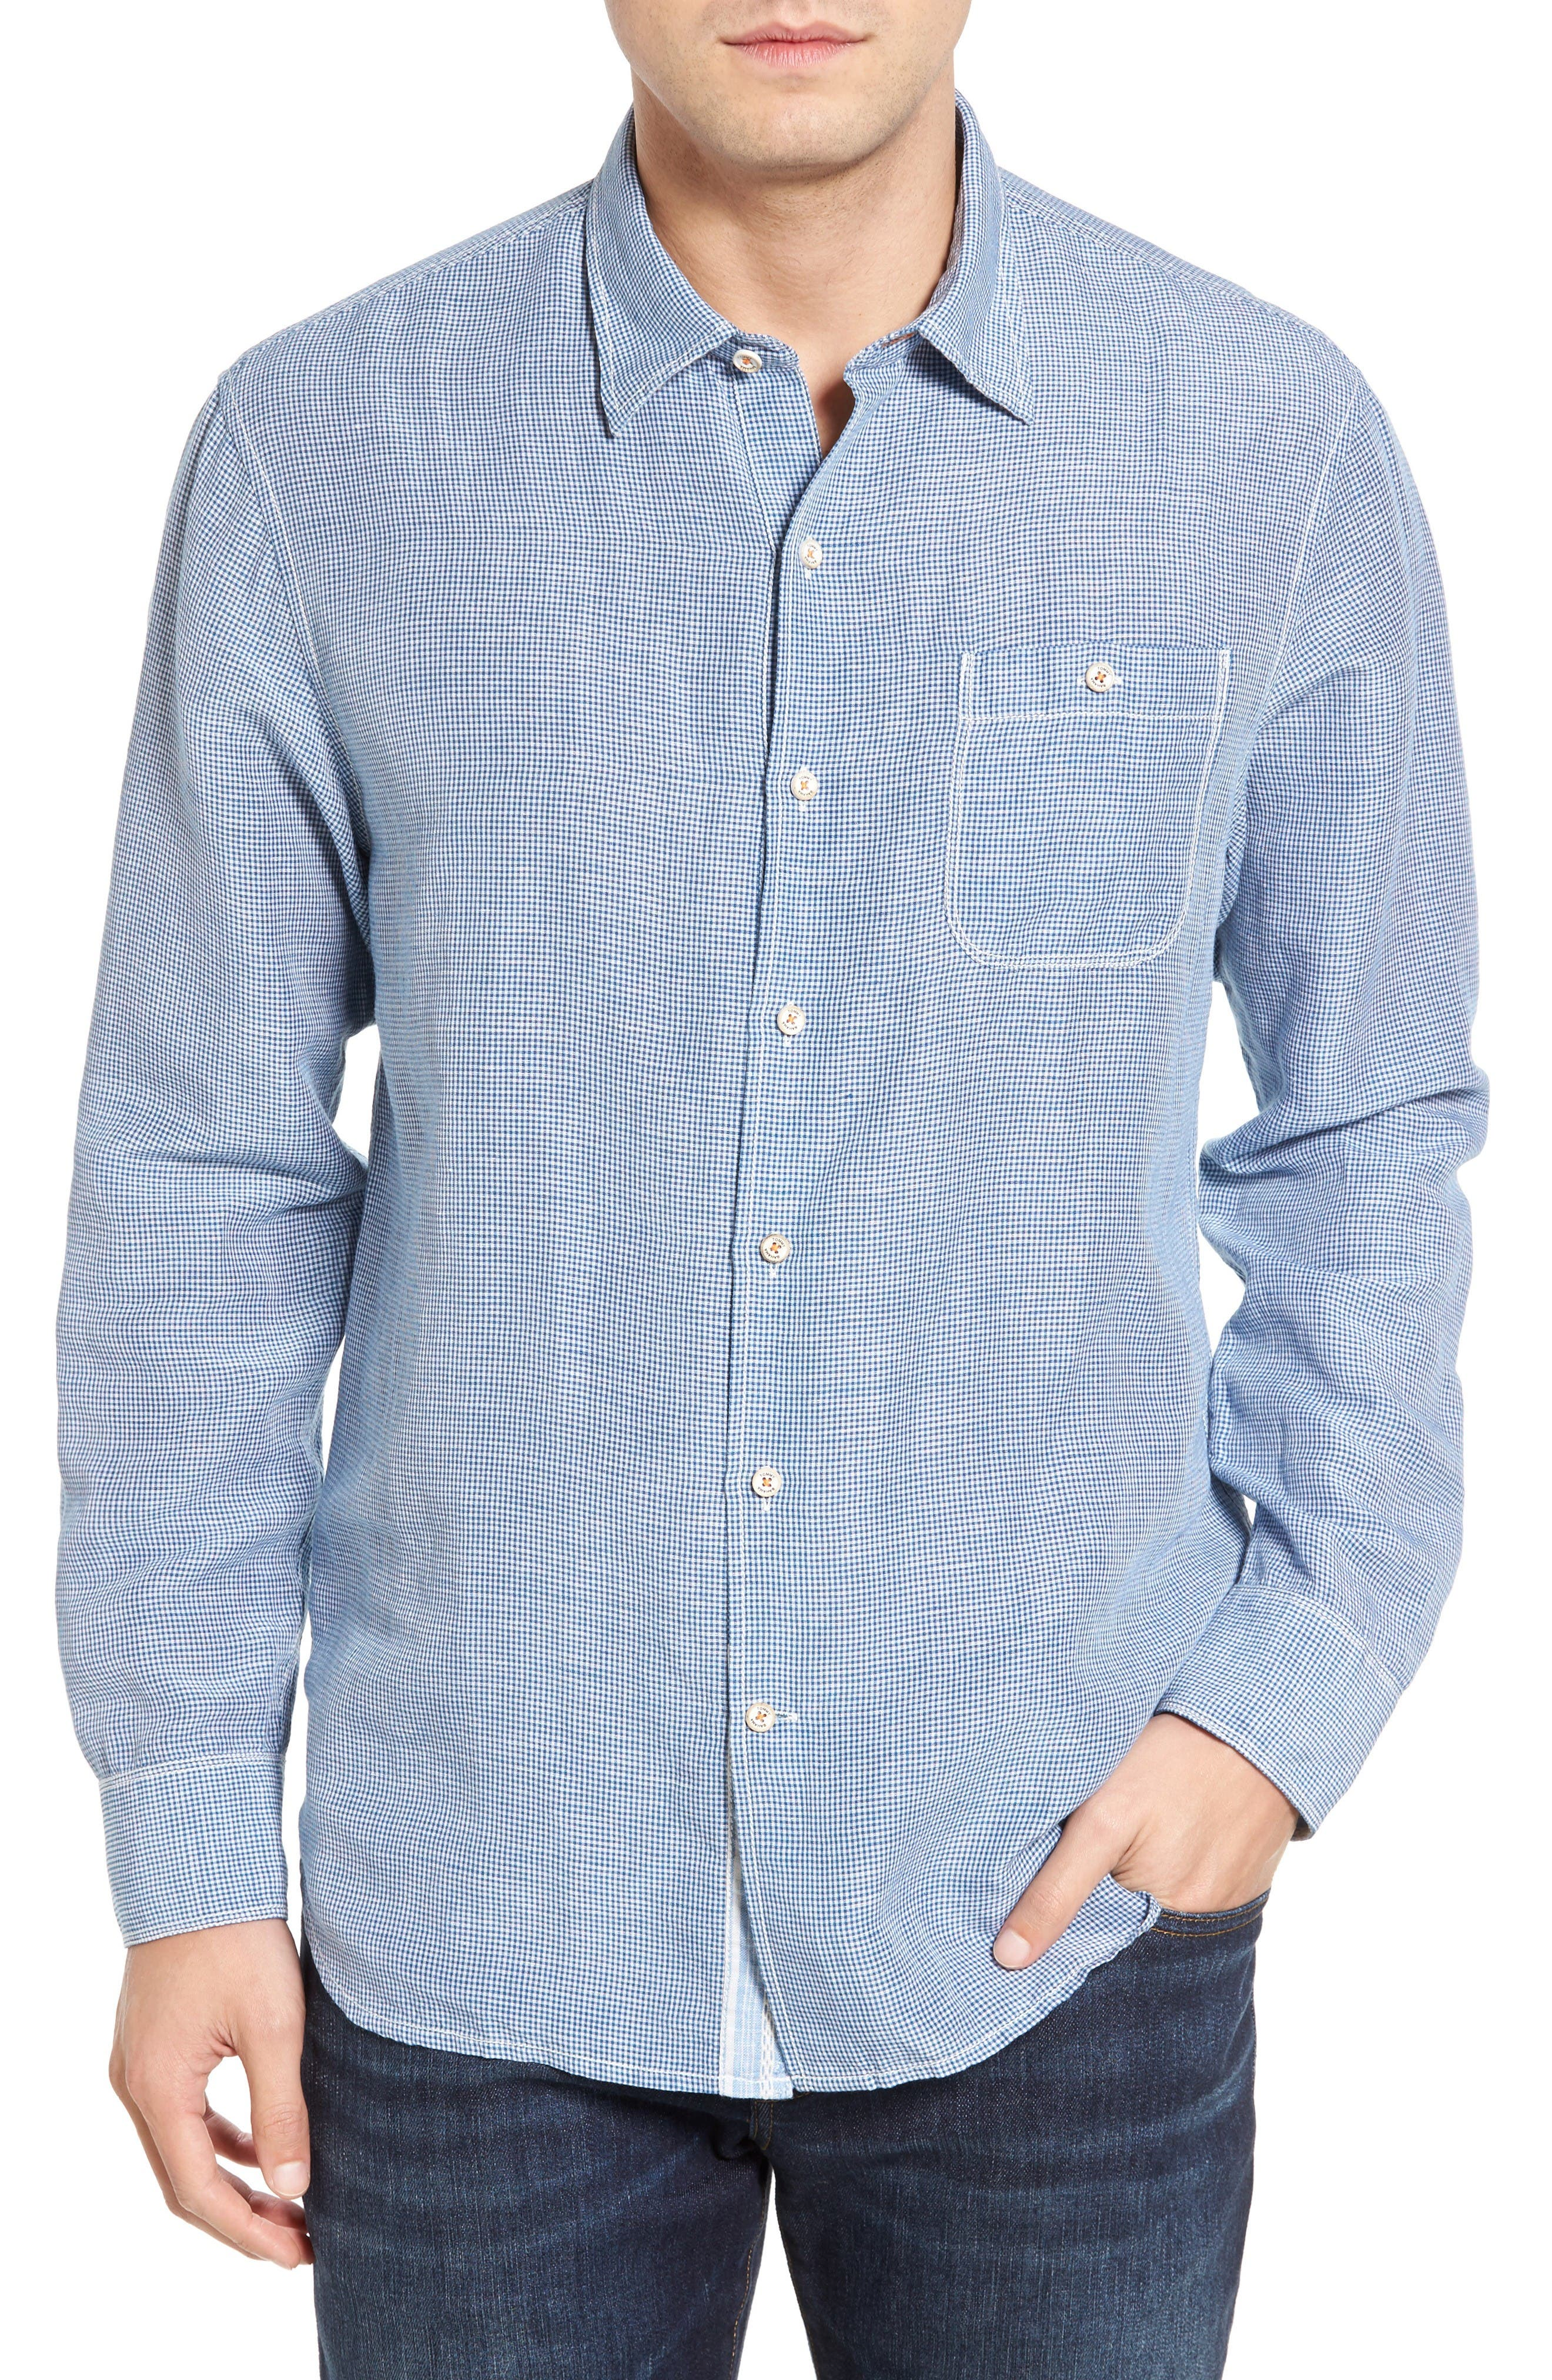 Alternate Image 1 Selected - Tommy Bahama Sand Linen Island Modern Fit Sport Shirt